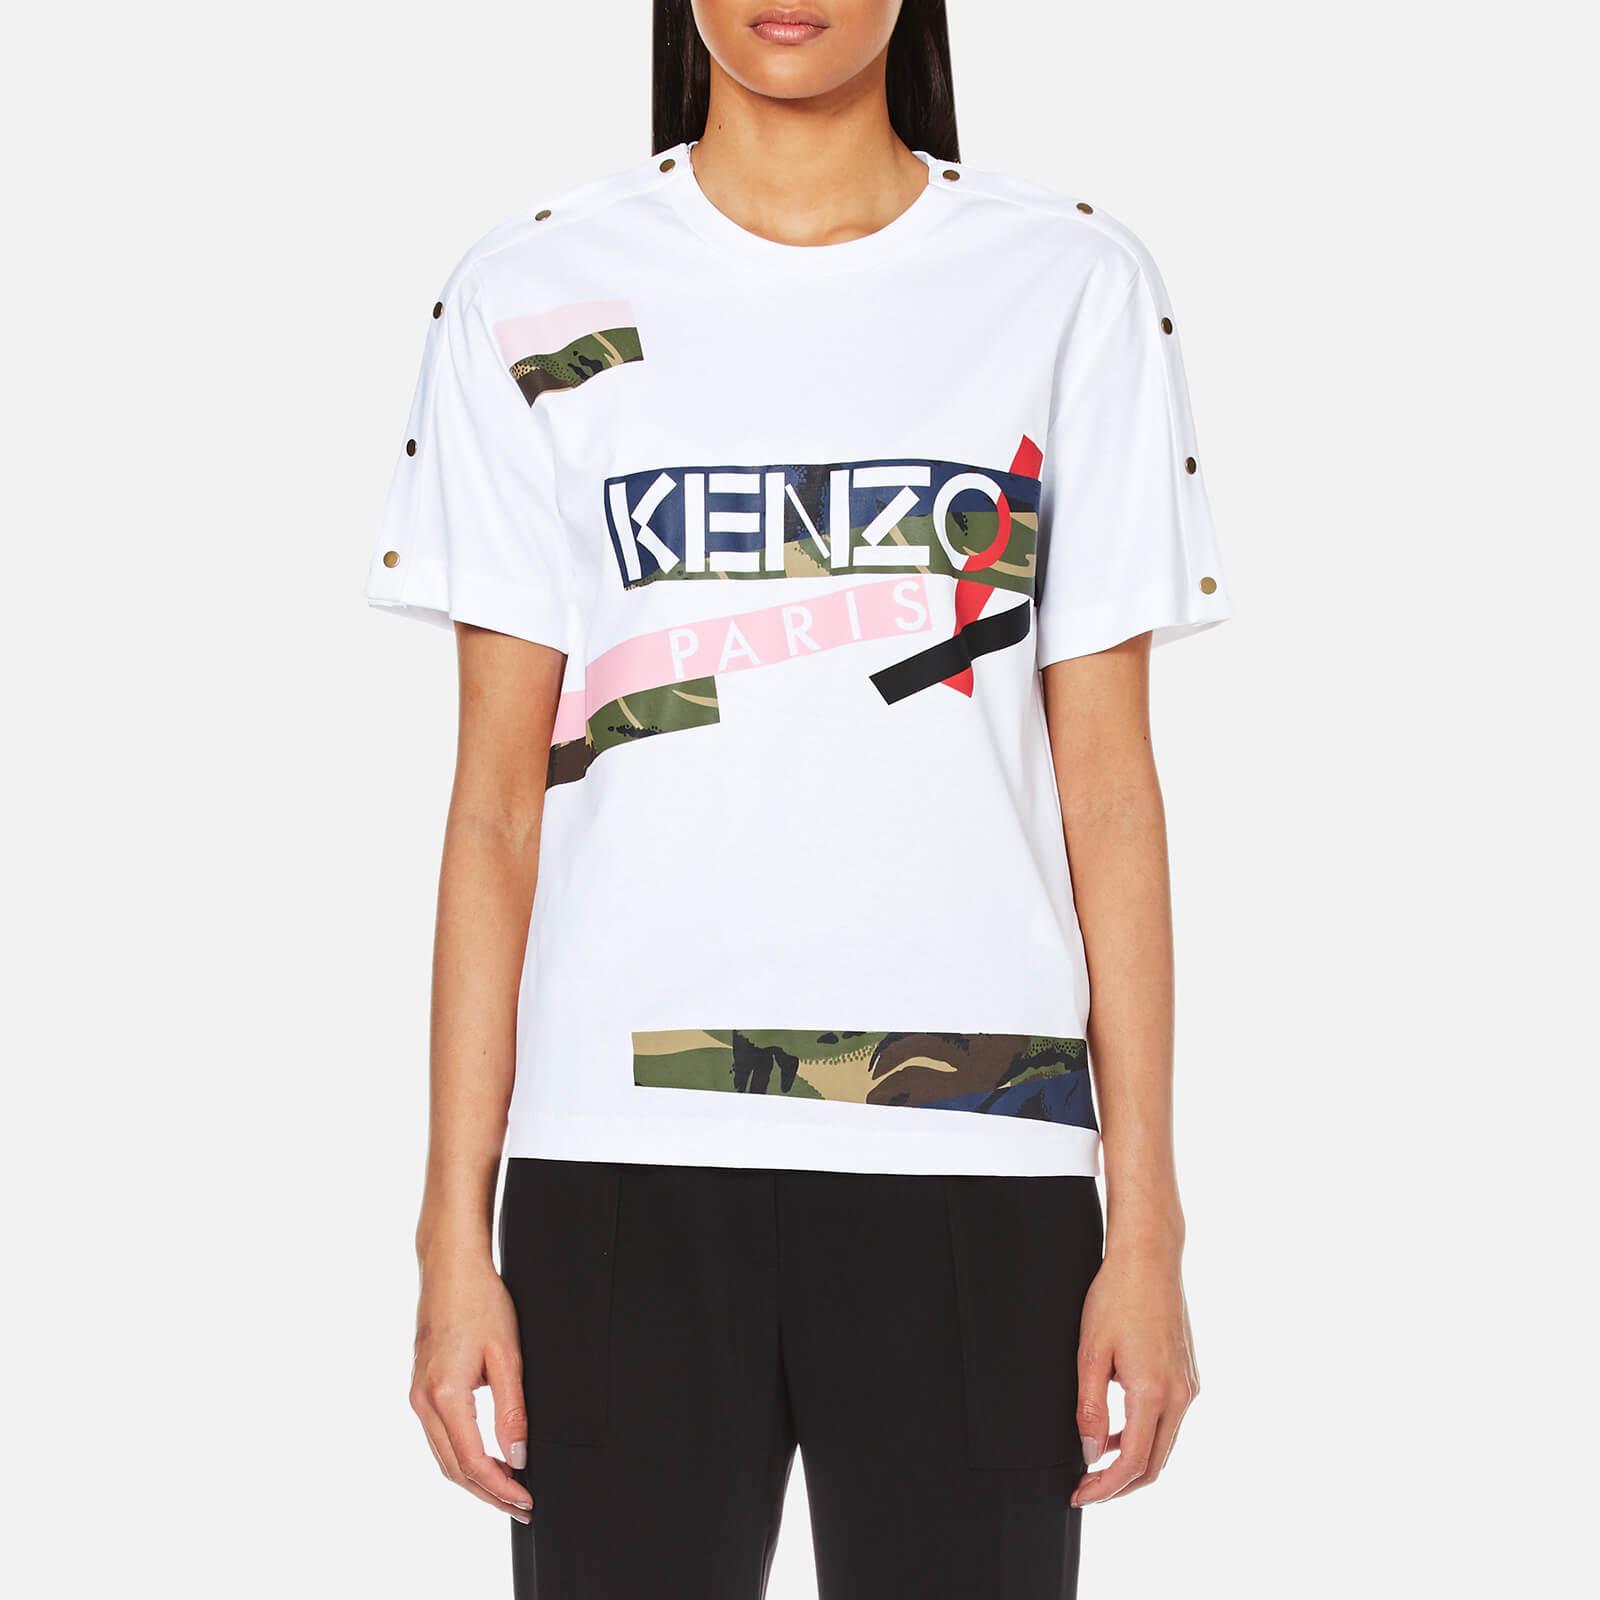 4157e0559e71b KENZO Women s Pima Cotton Jersey Logo T-Shirt - White - Free UK Delivery  over £50